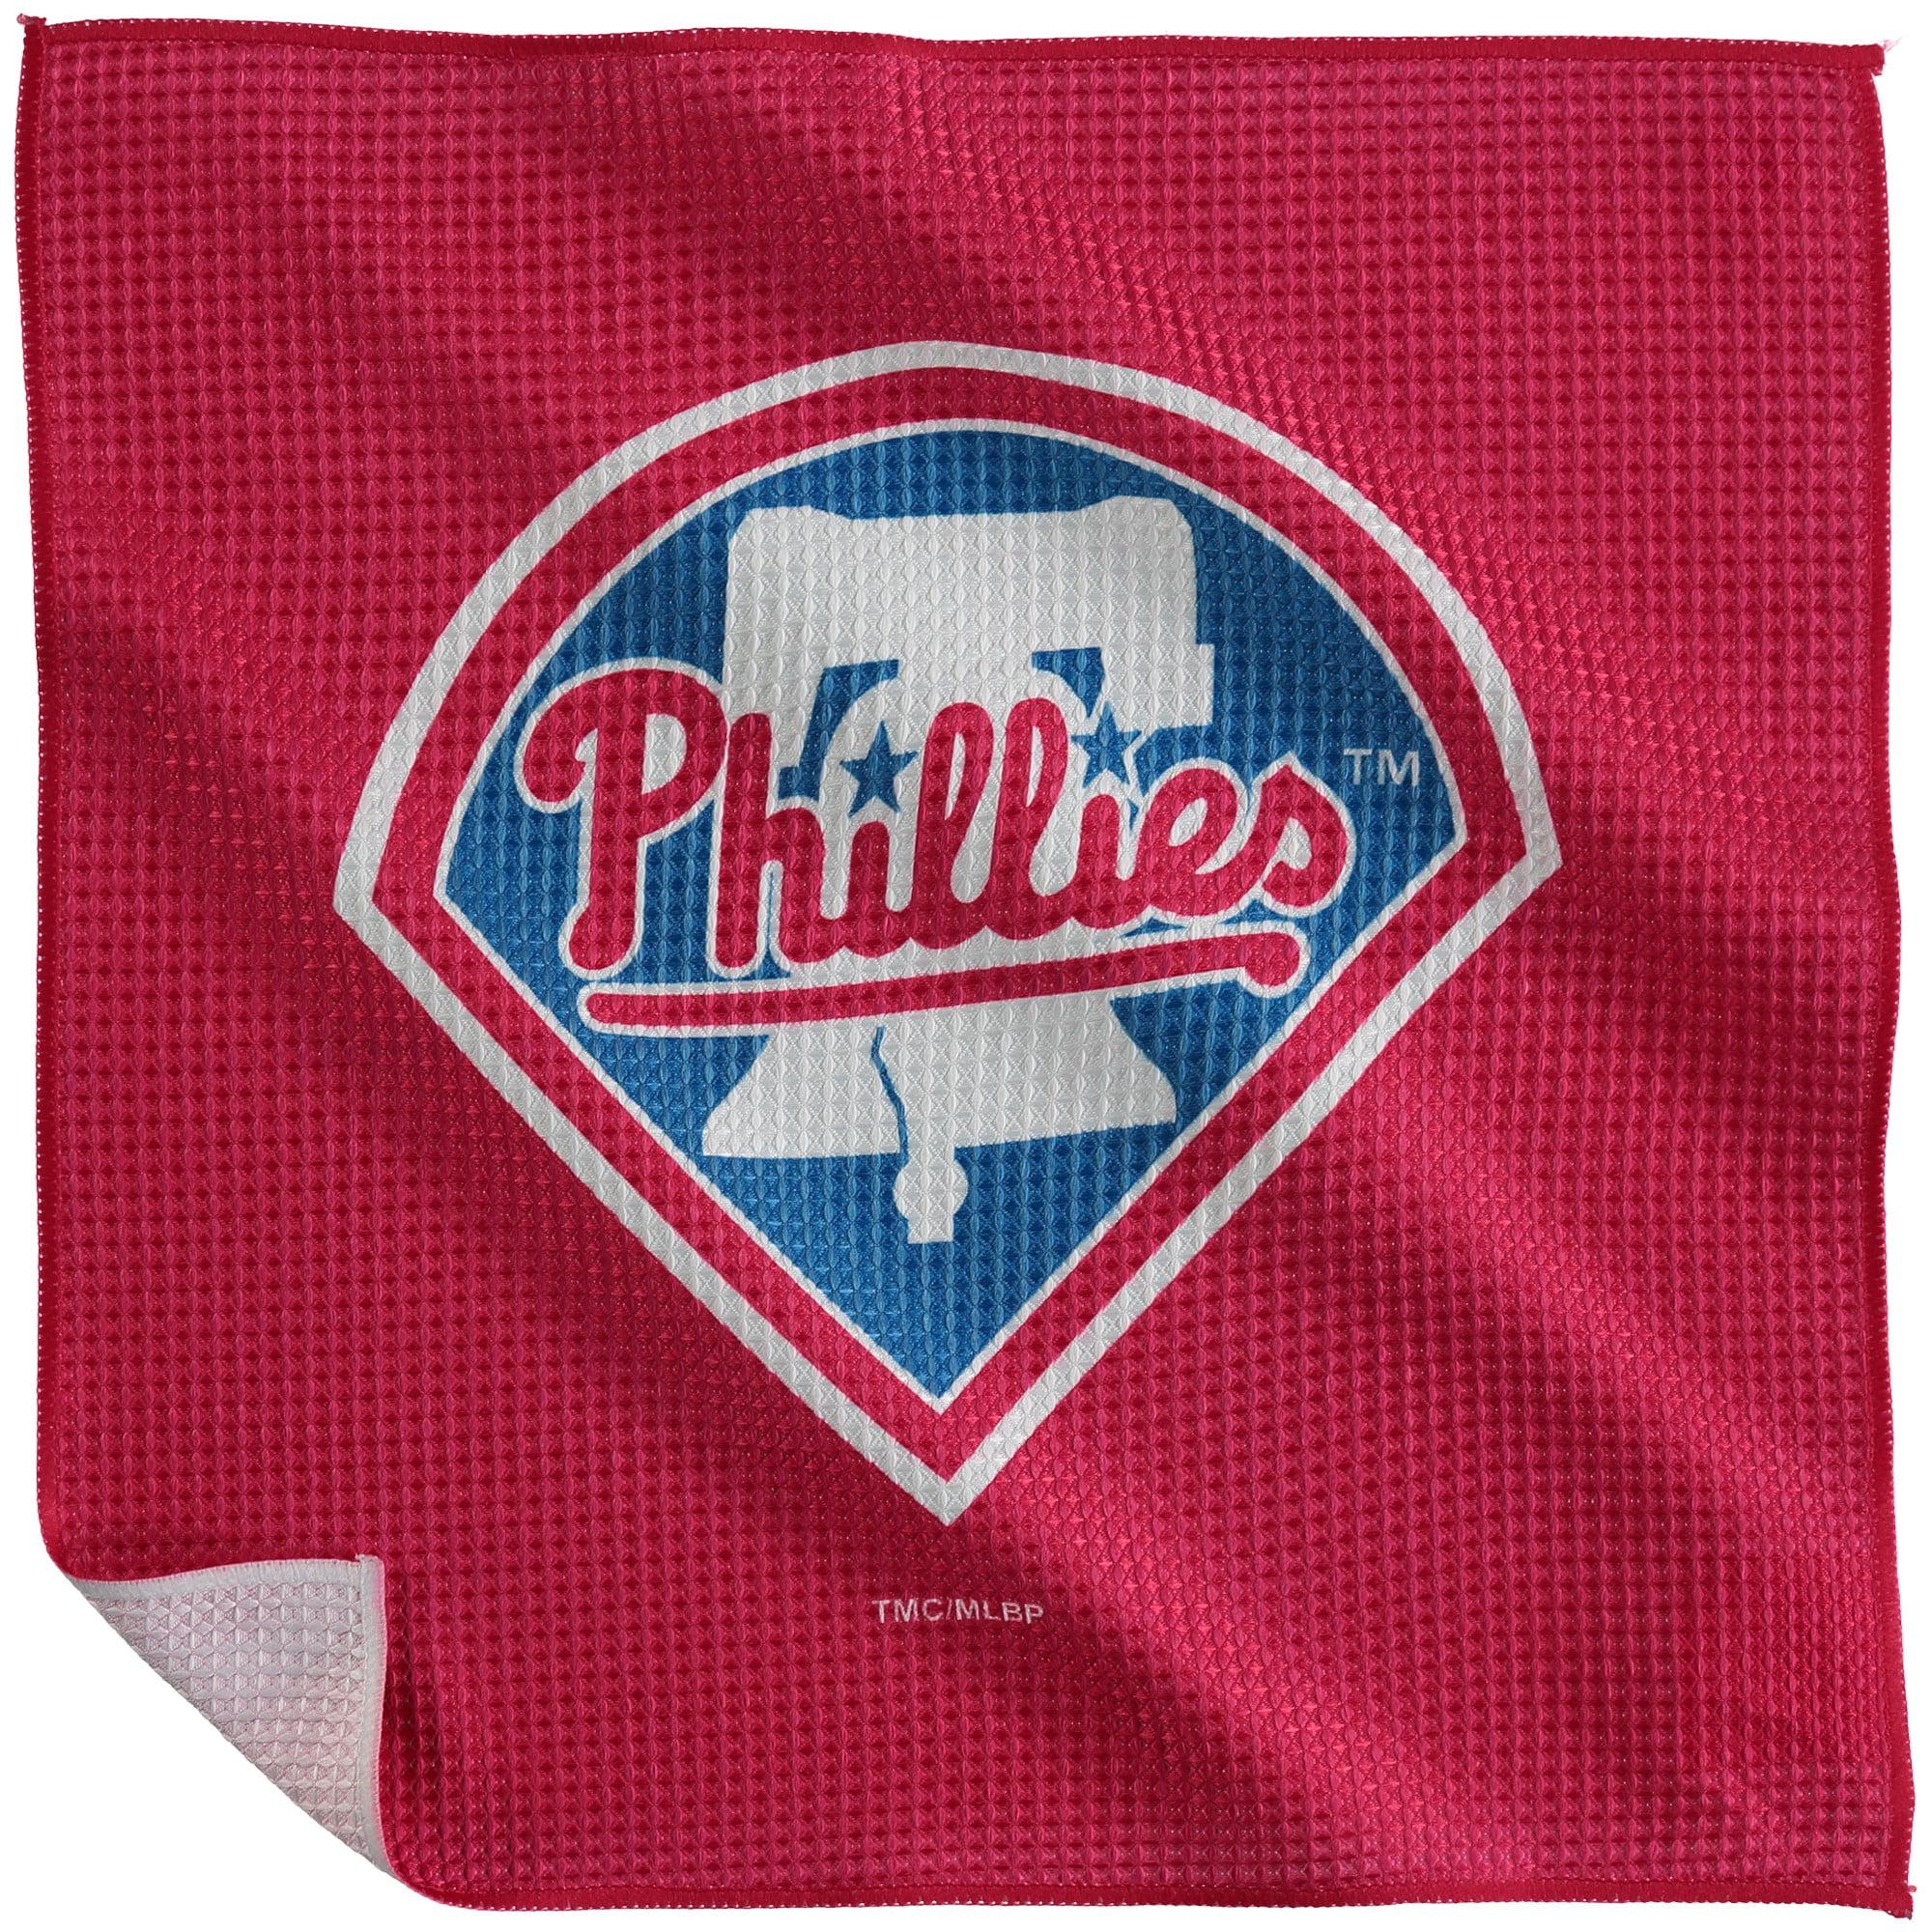 "Philadelphia Phillies 16"" x 16"" Microfiber Towel - No Size"